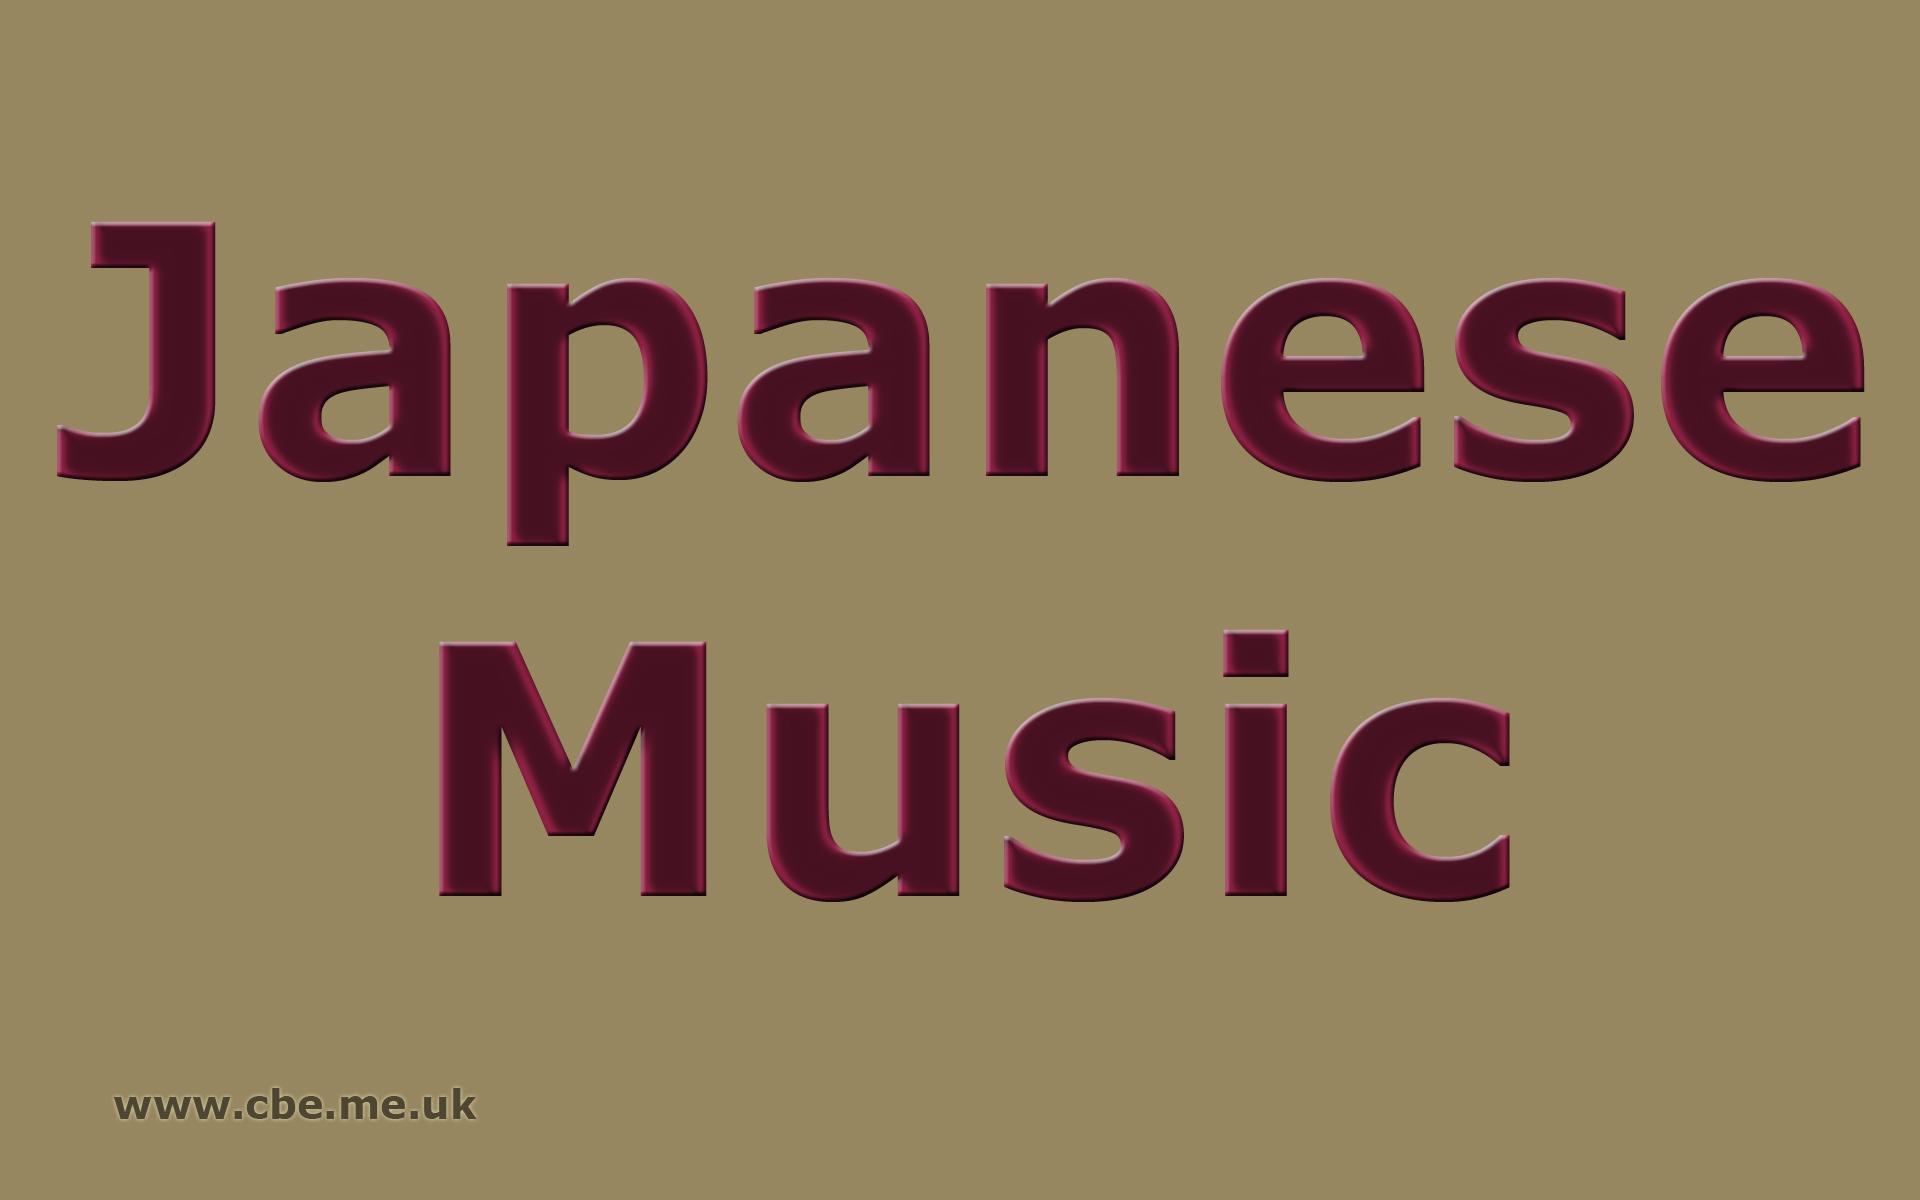 Japanese Music 1920x1200